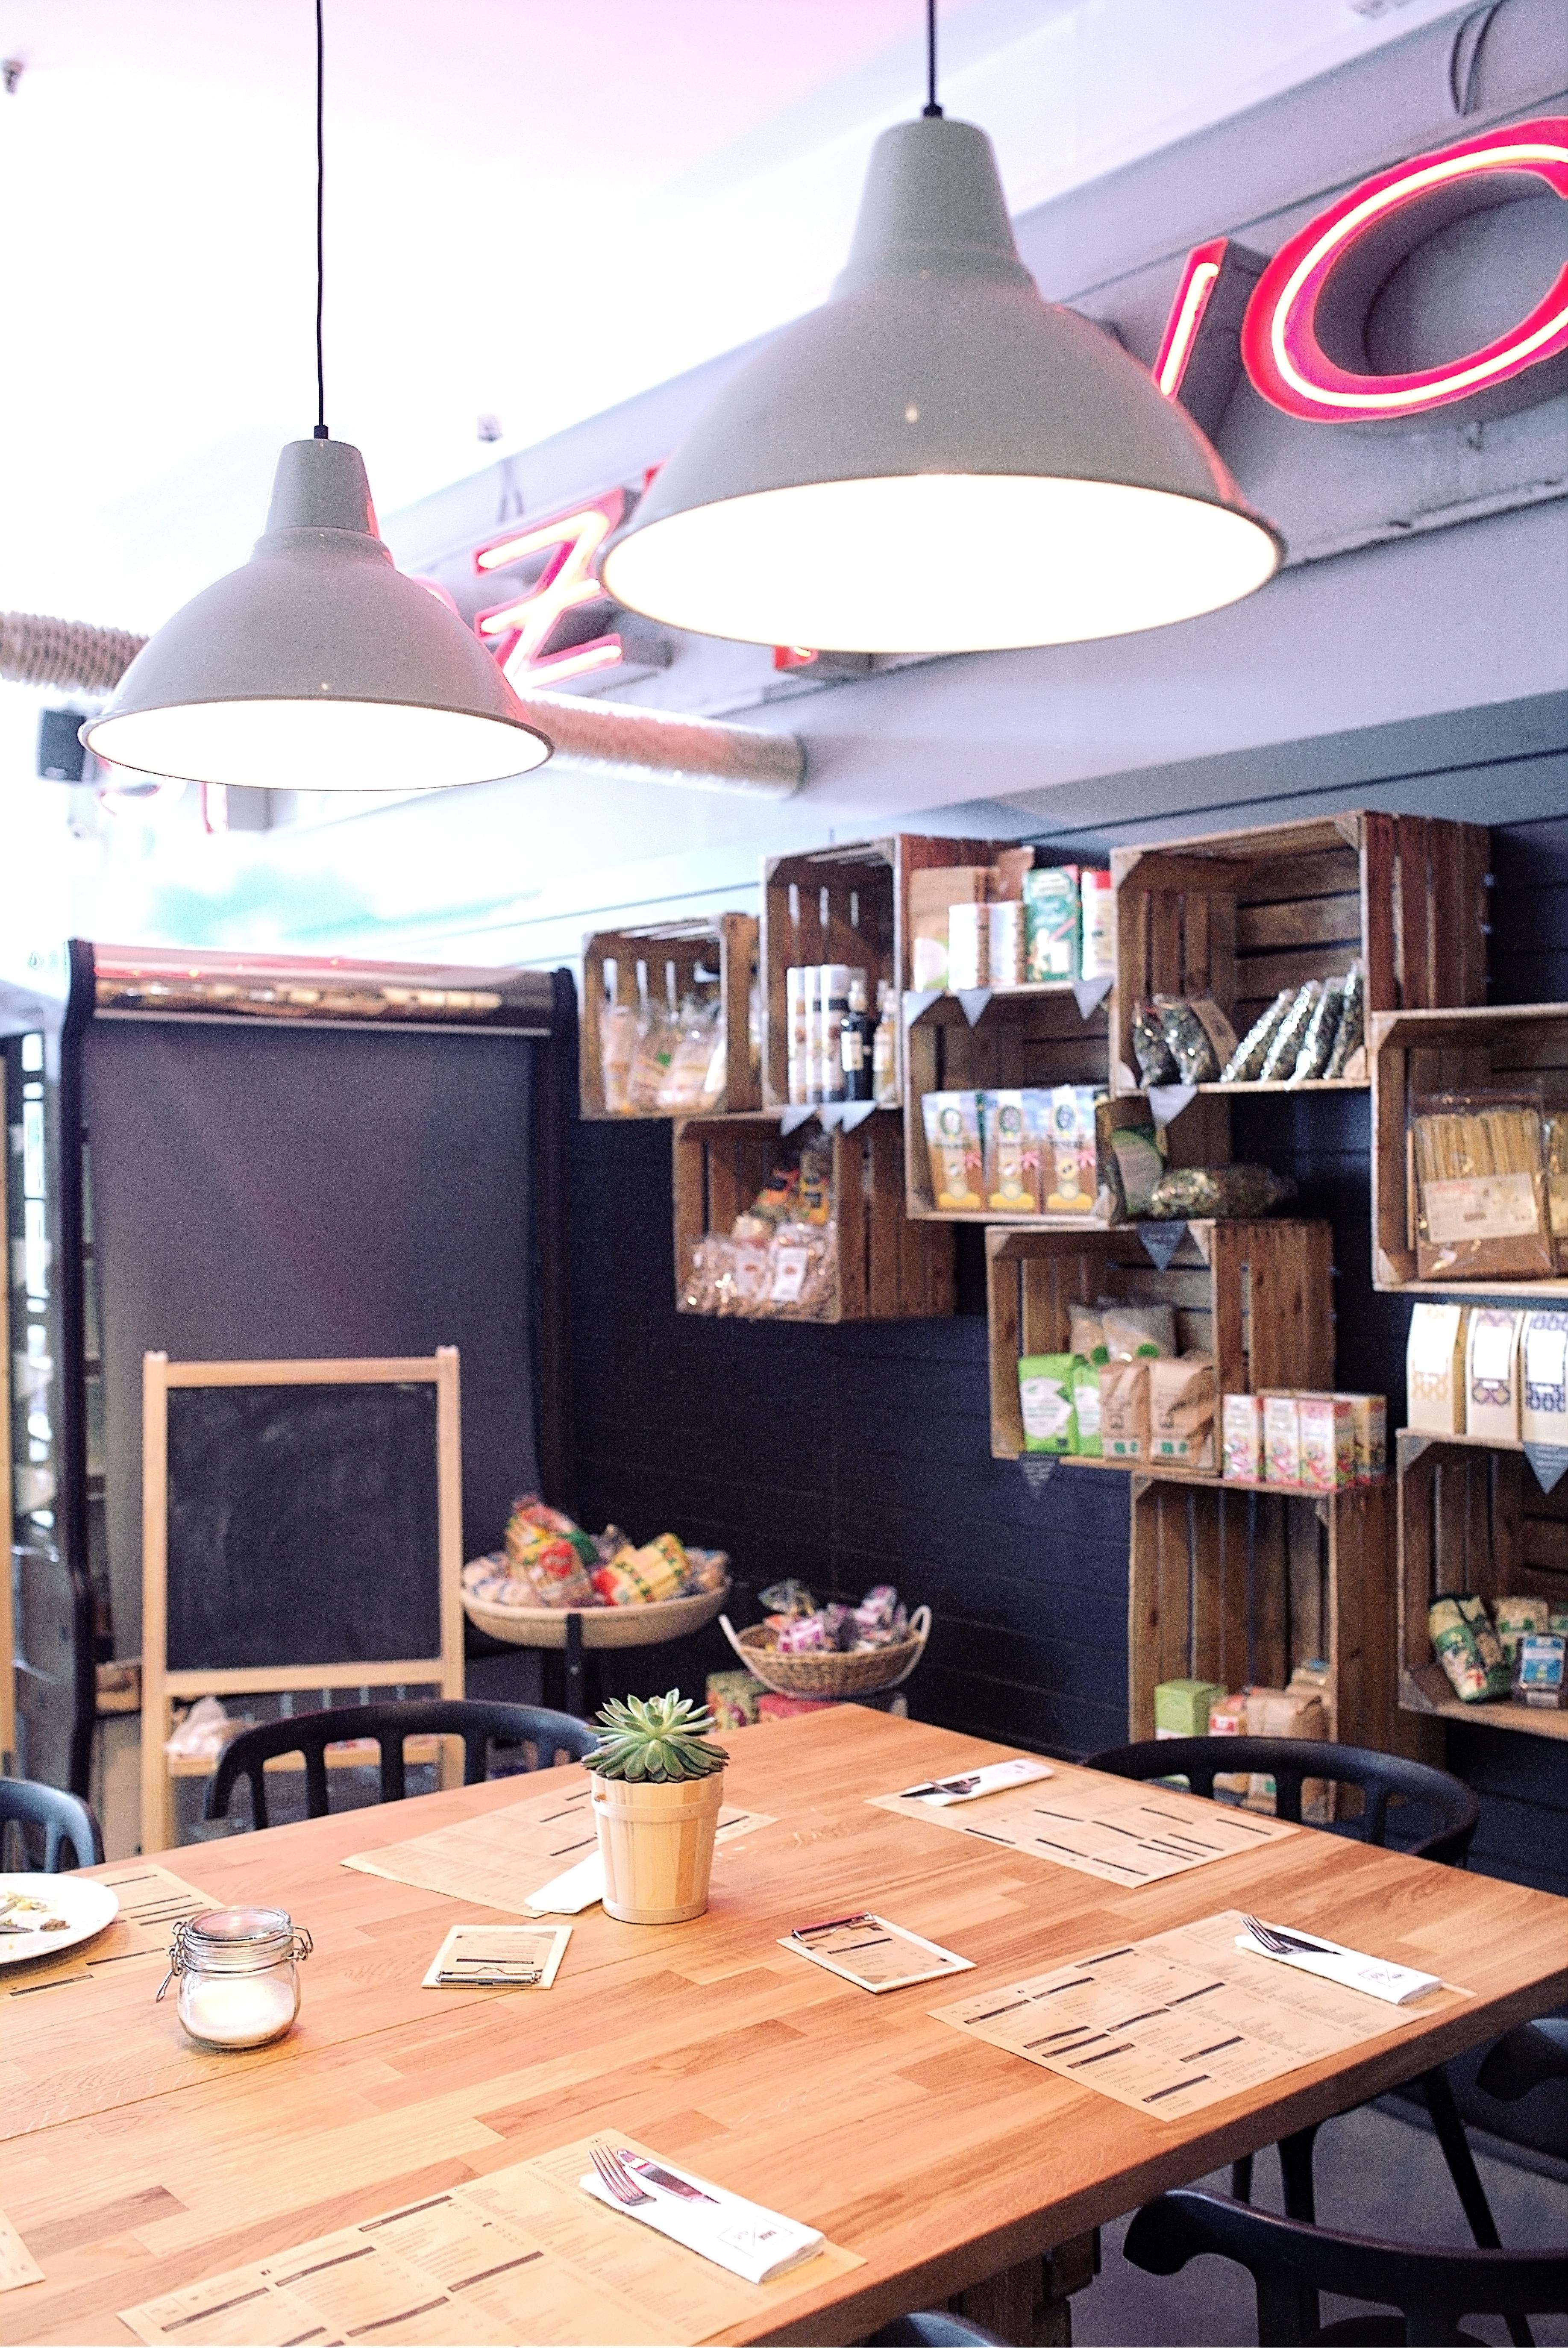 Fotos gratis mesa vendimia interior restaurante casa for Decoracion de interiores virtual gratis